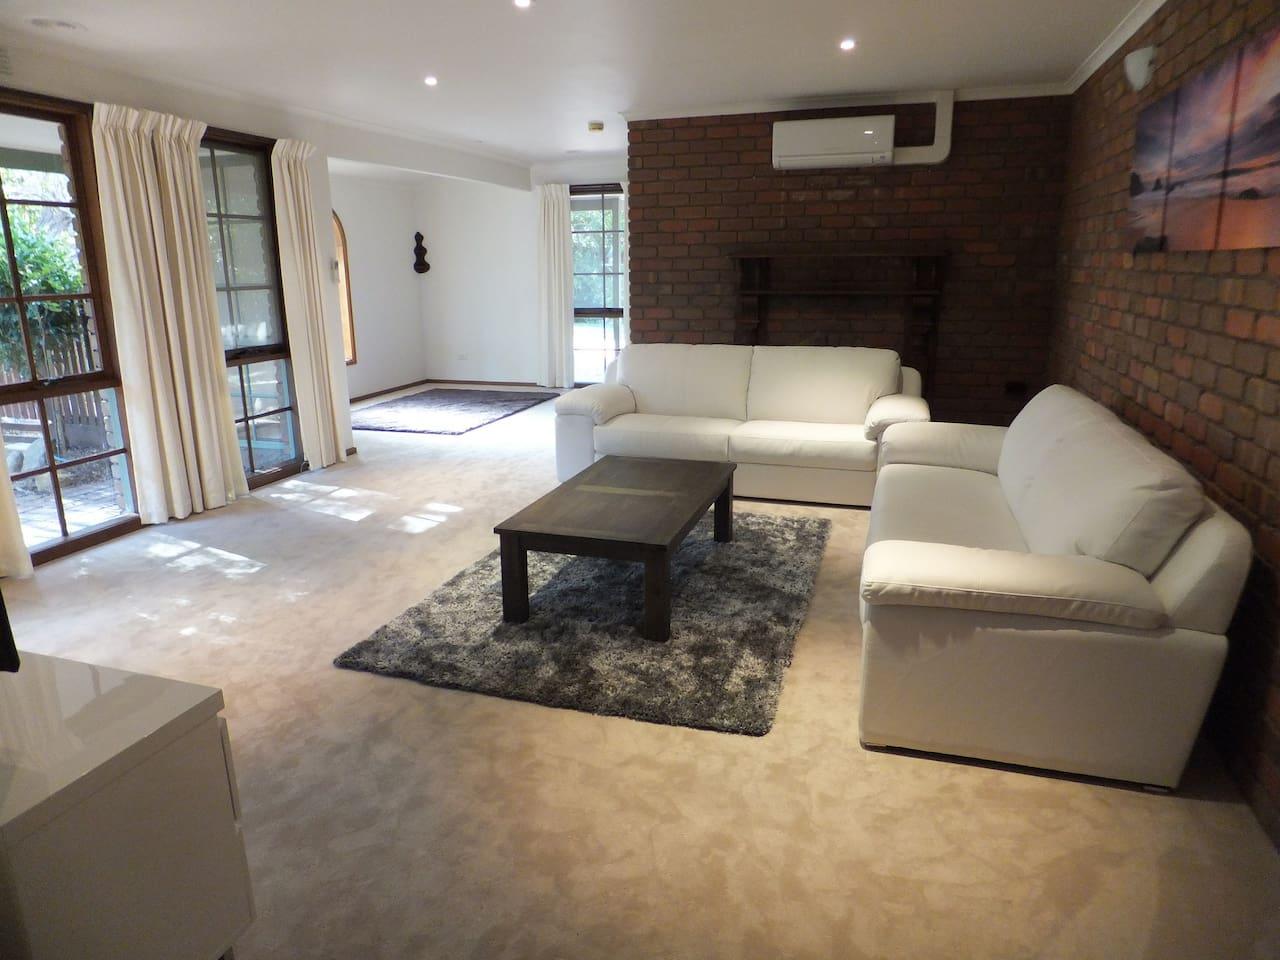 Lounge - air con, TV, bluray player